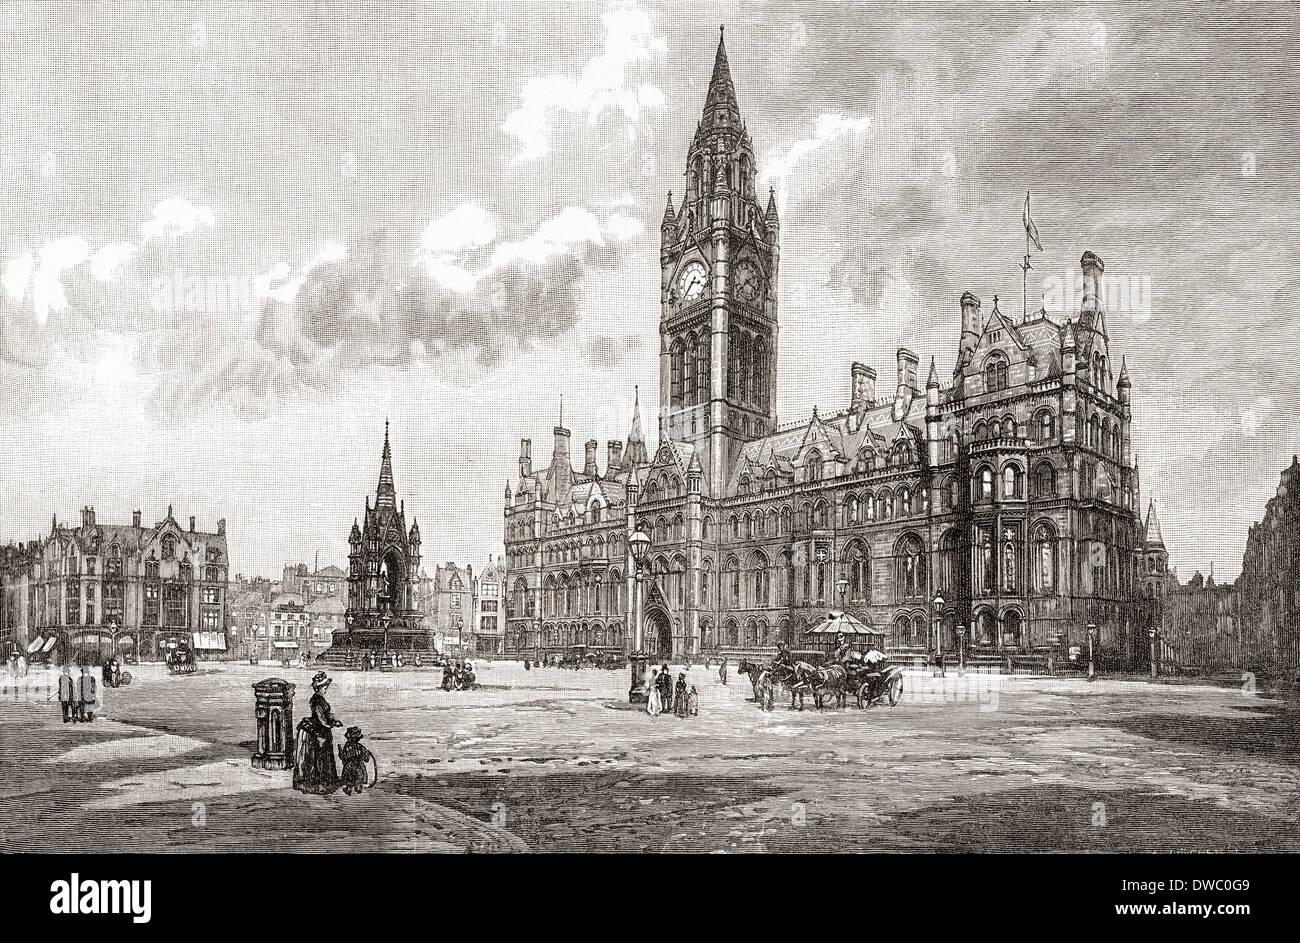 Ayuntamiento, Albert Square, Manchester, Inglaterra en el siglo XIX. Imagen De Stock